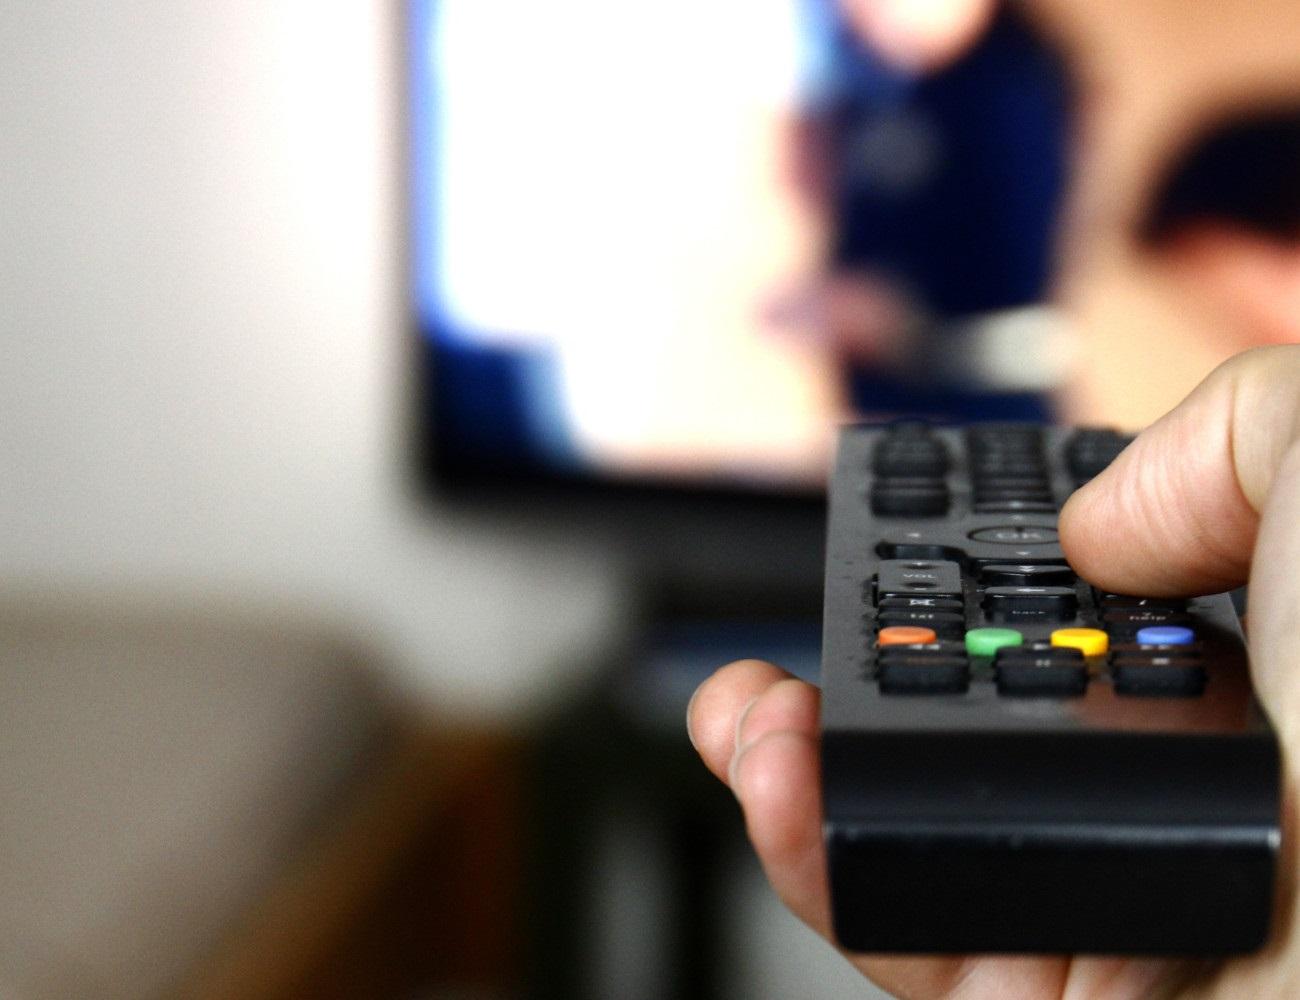 Competencia multa a Mediaset con 460.840 euros por incumplir la normativa de contenidos publicitarios